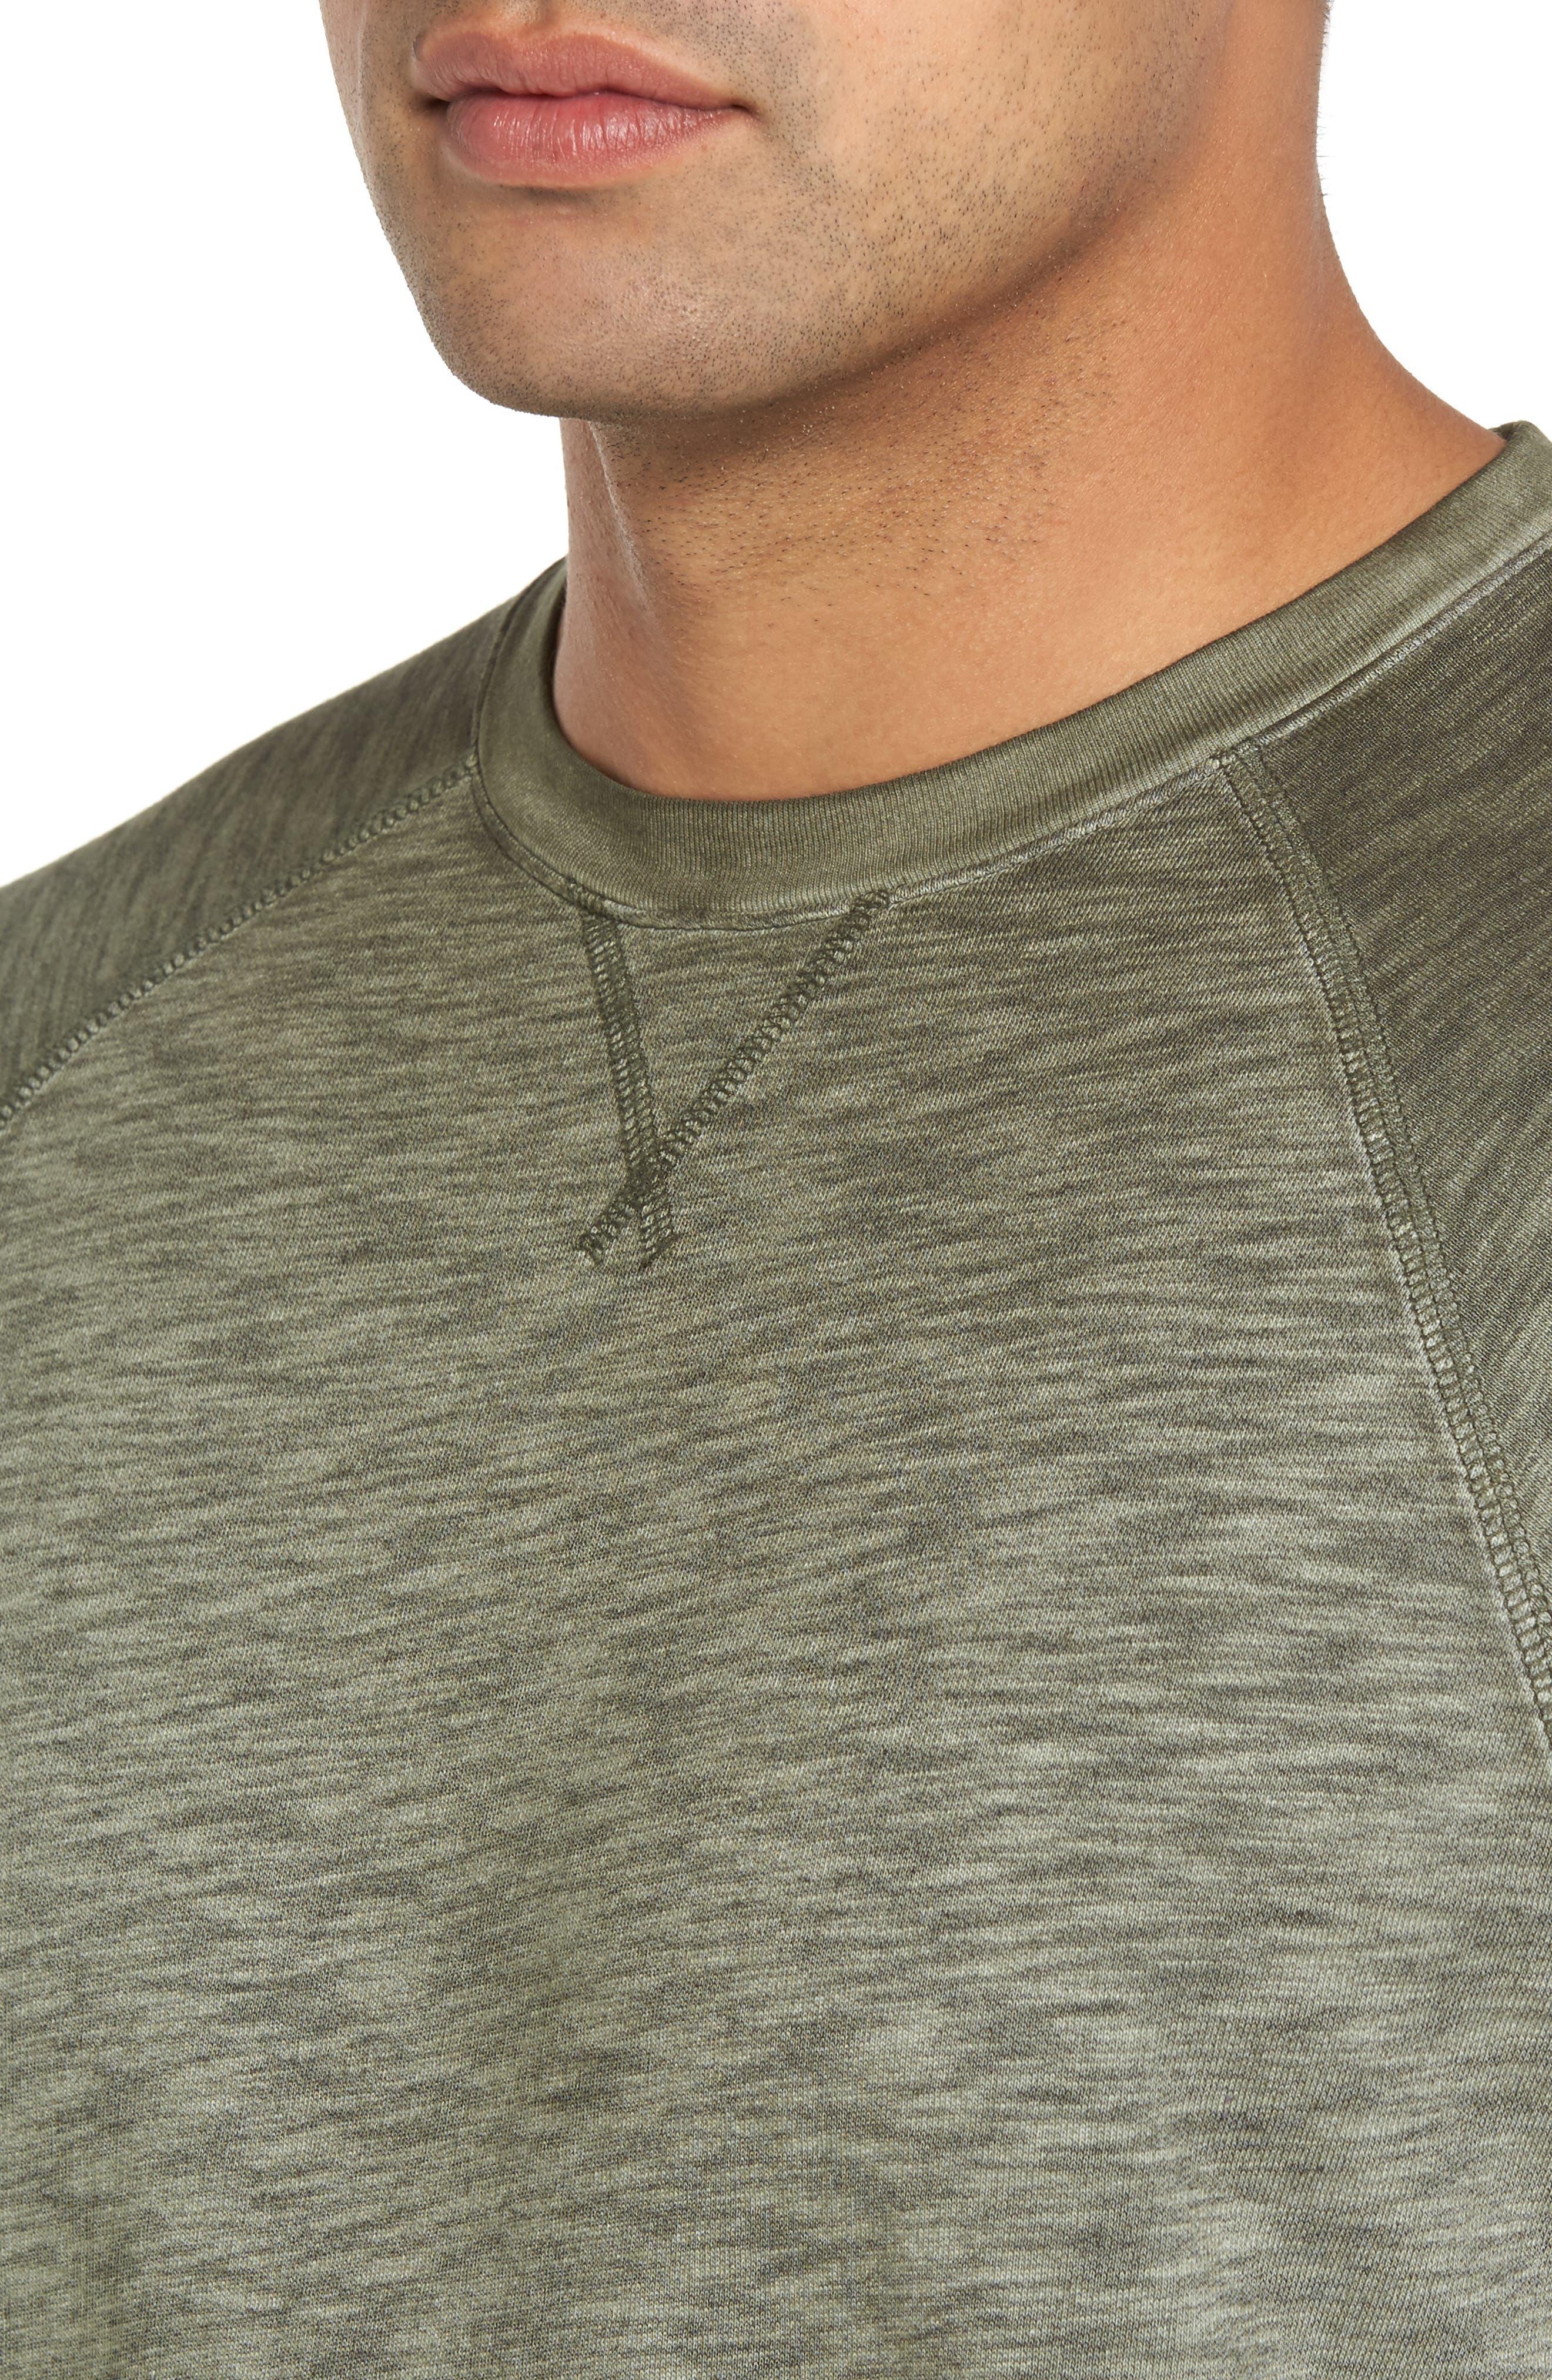 Alternate Image 4  - Tommy Bahama 'Santiago' Ombré Crewneck Sweatshirt